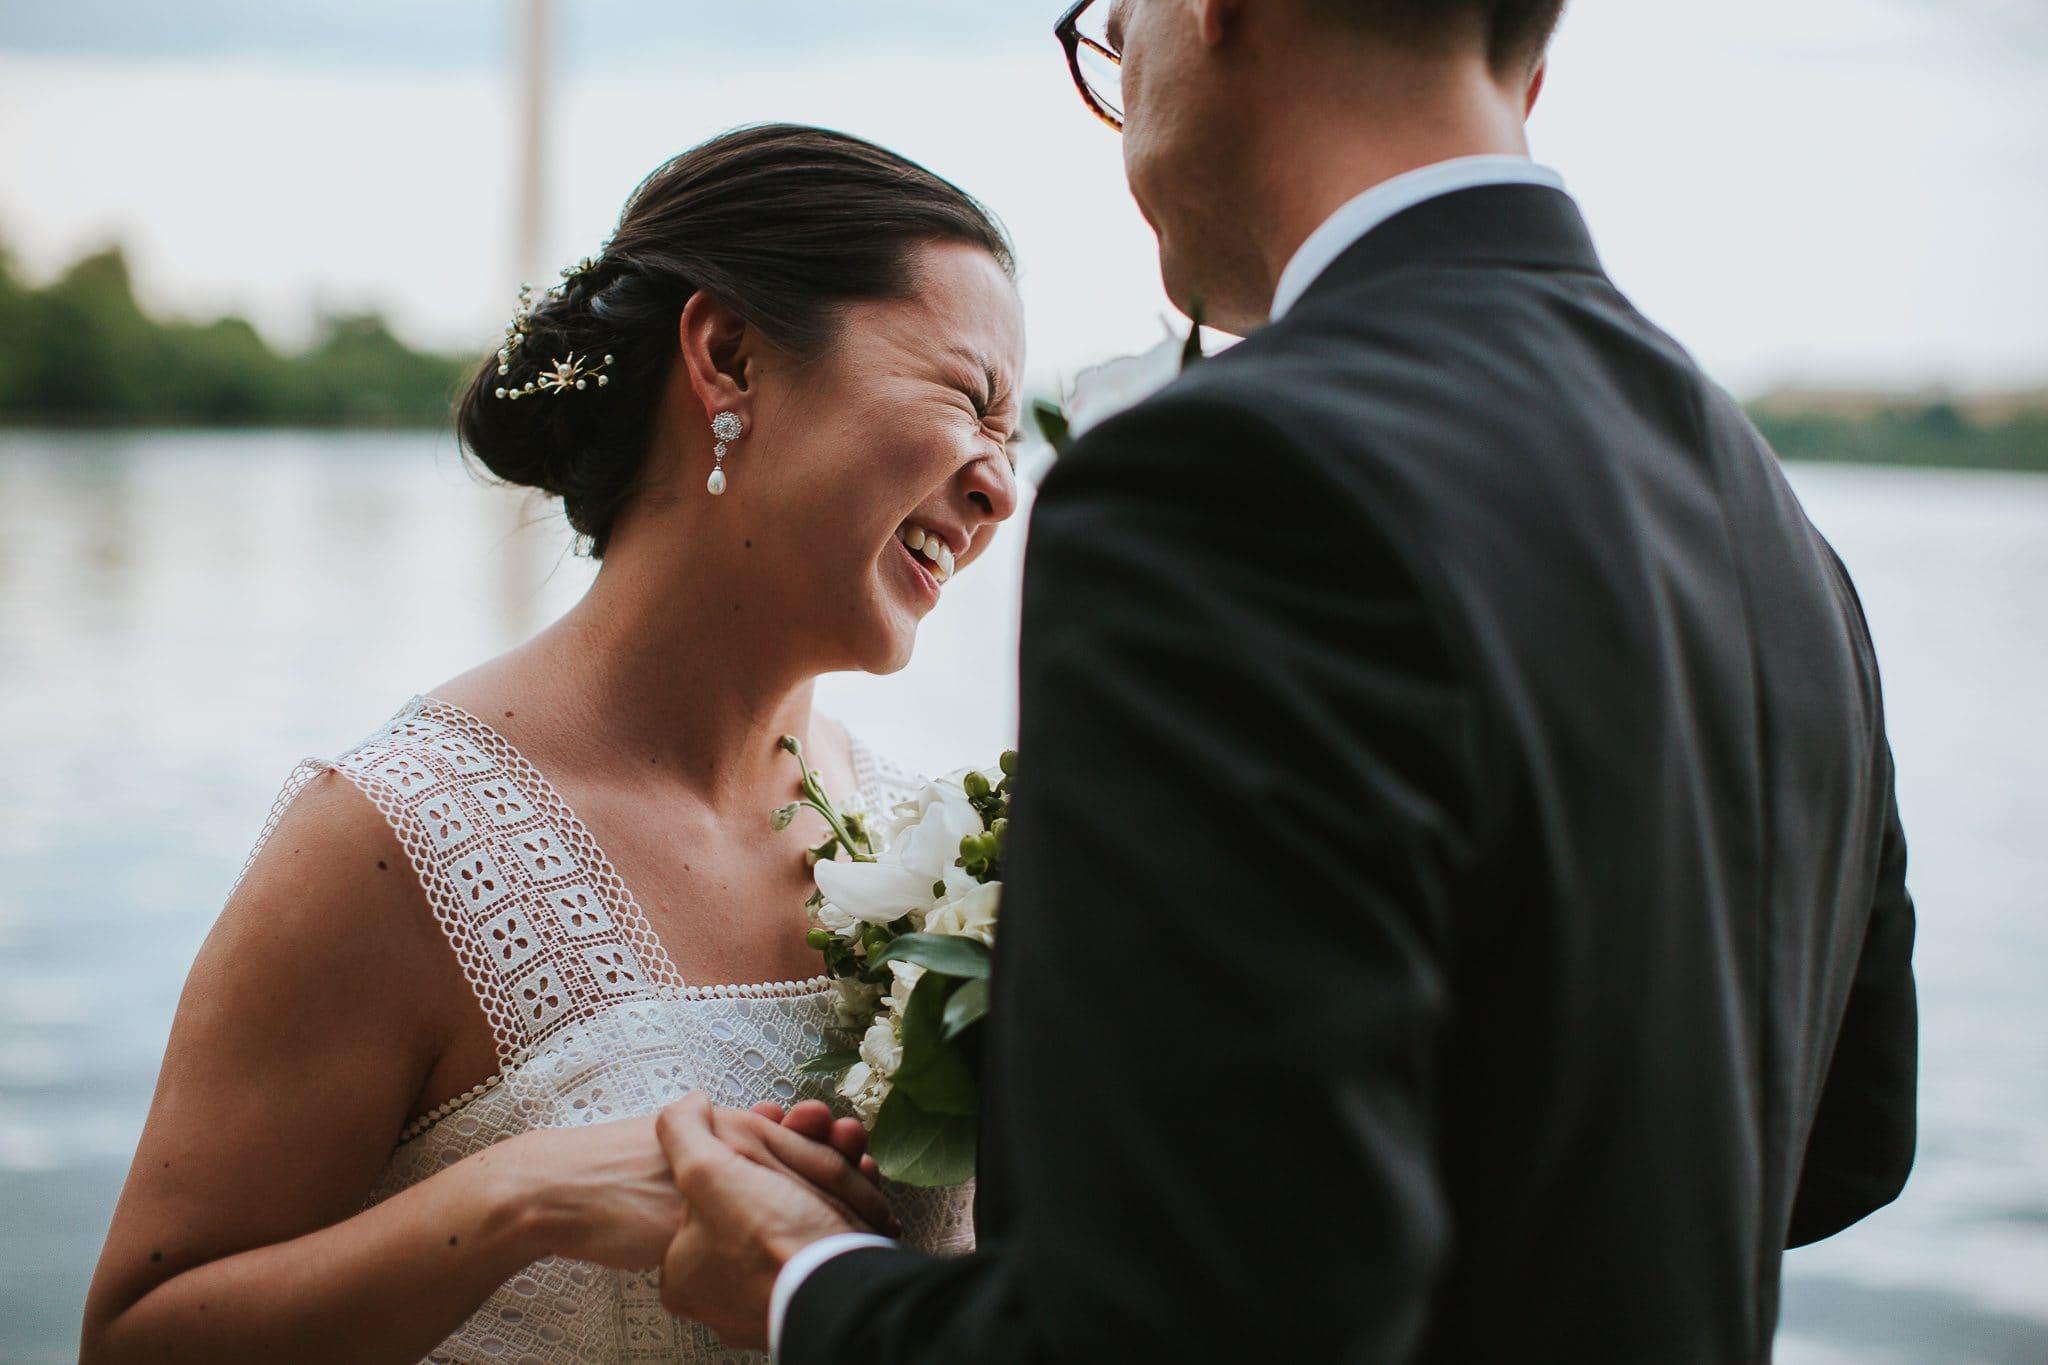 tidal basin wedding ceremony